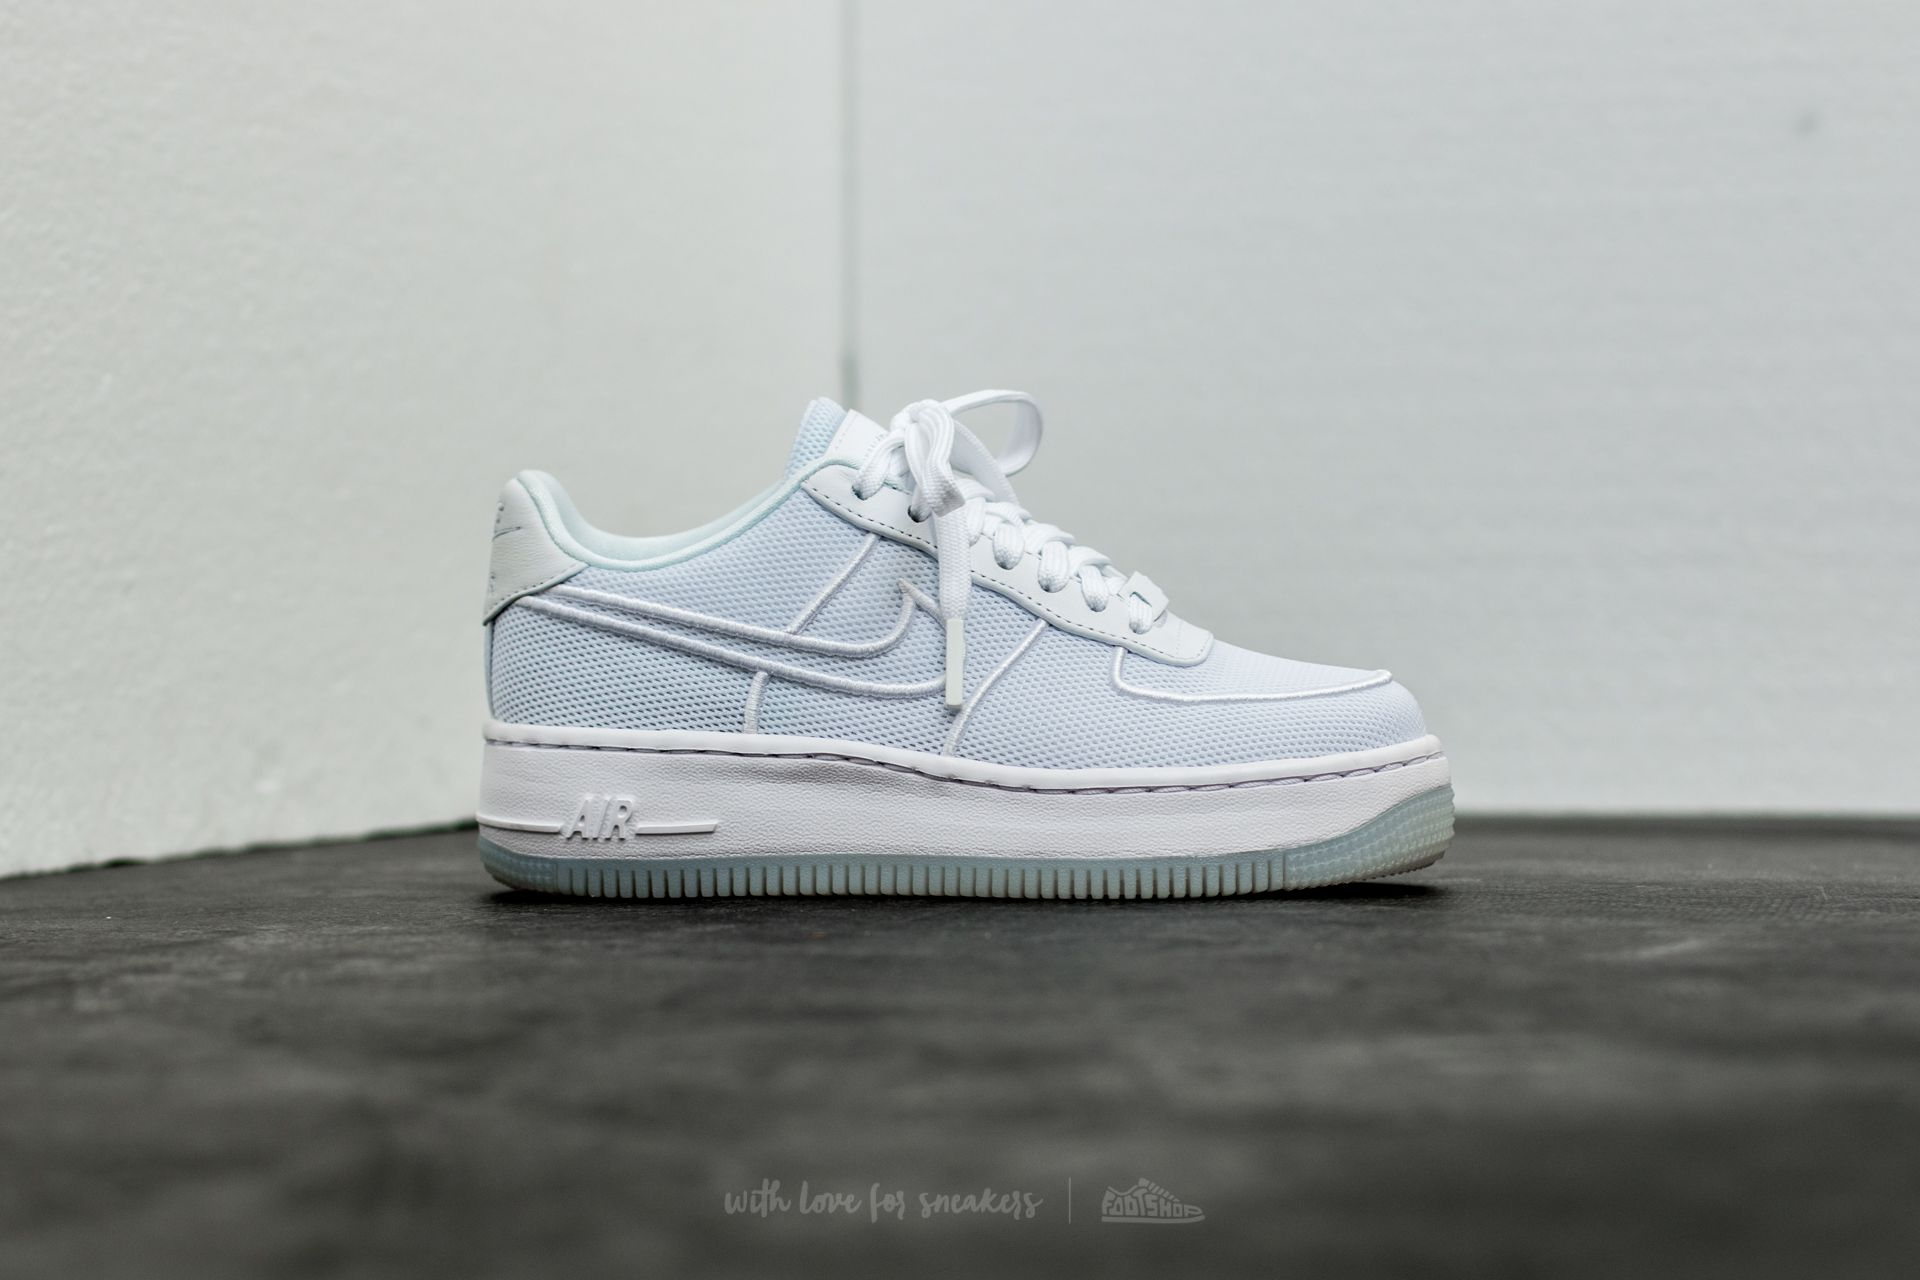 Upstep W Nike BlueFootshop Air 1 Br Glacier White Force Low xCeQrWBdo